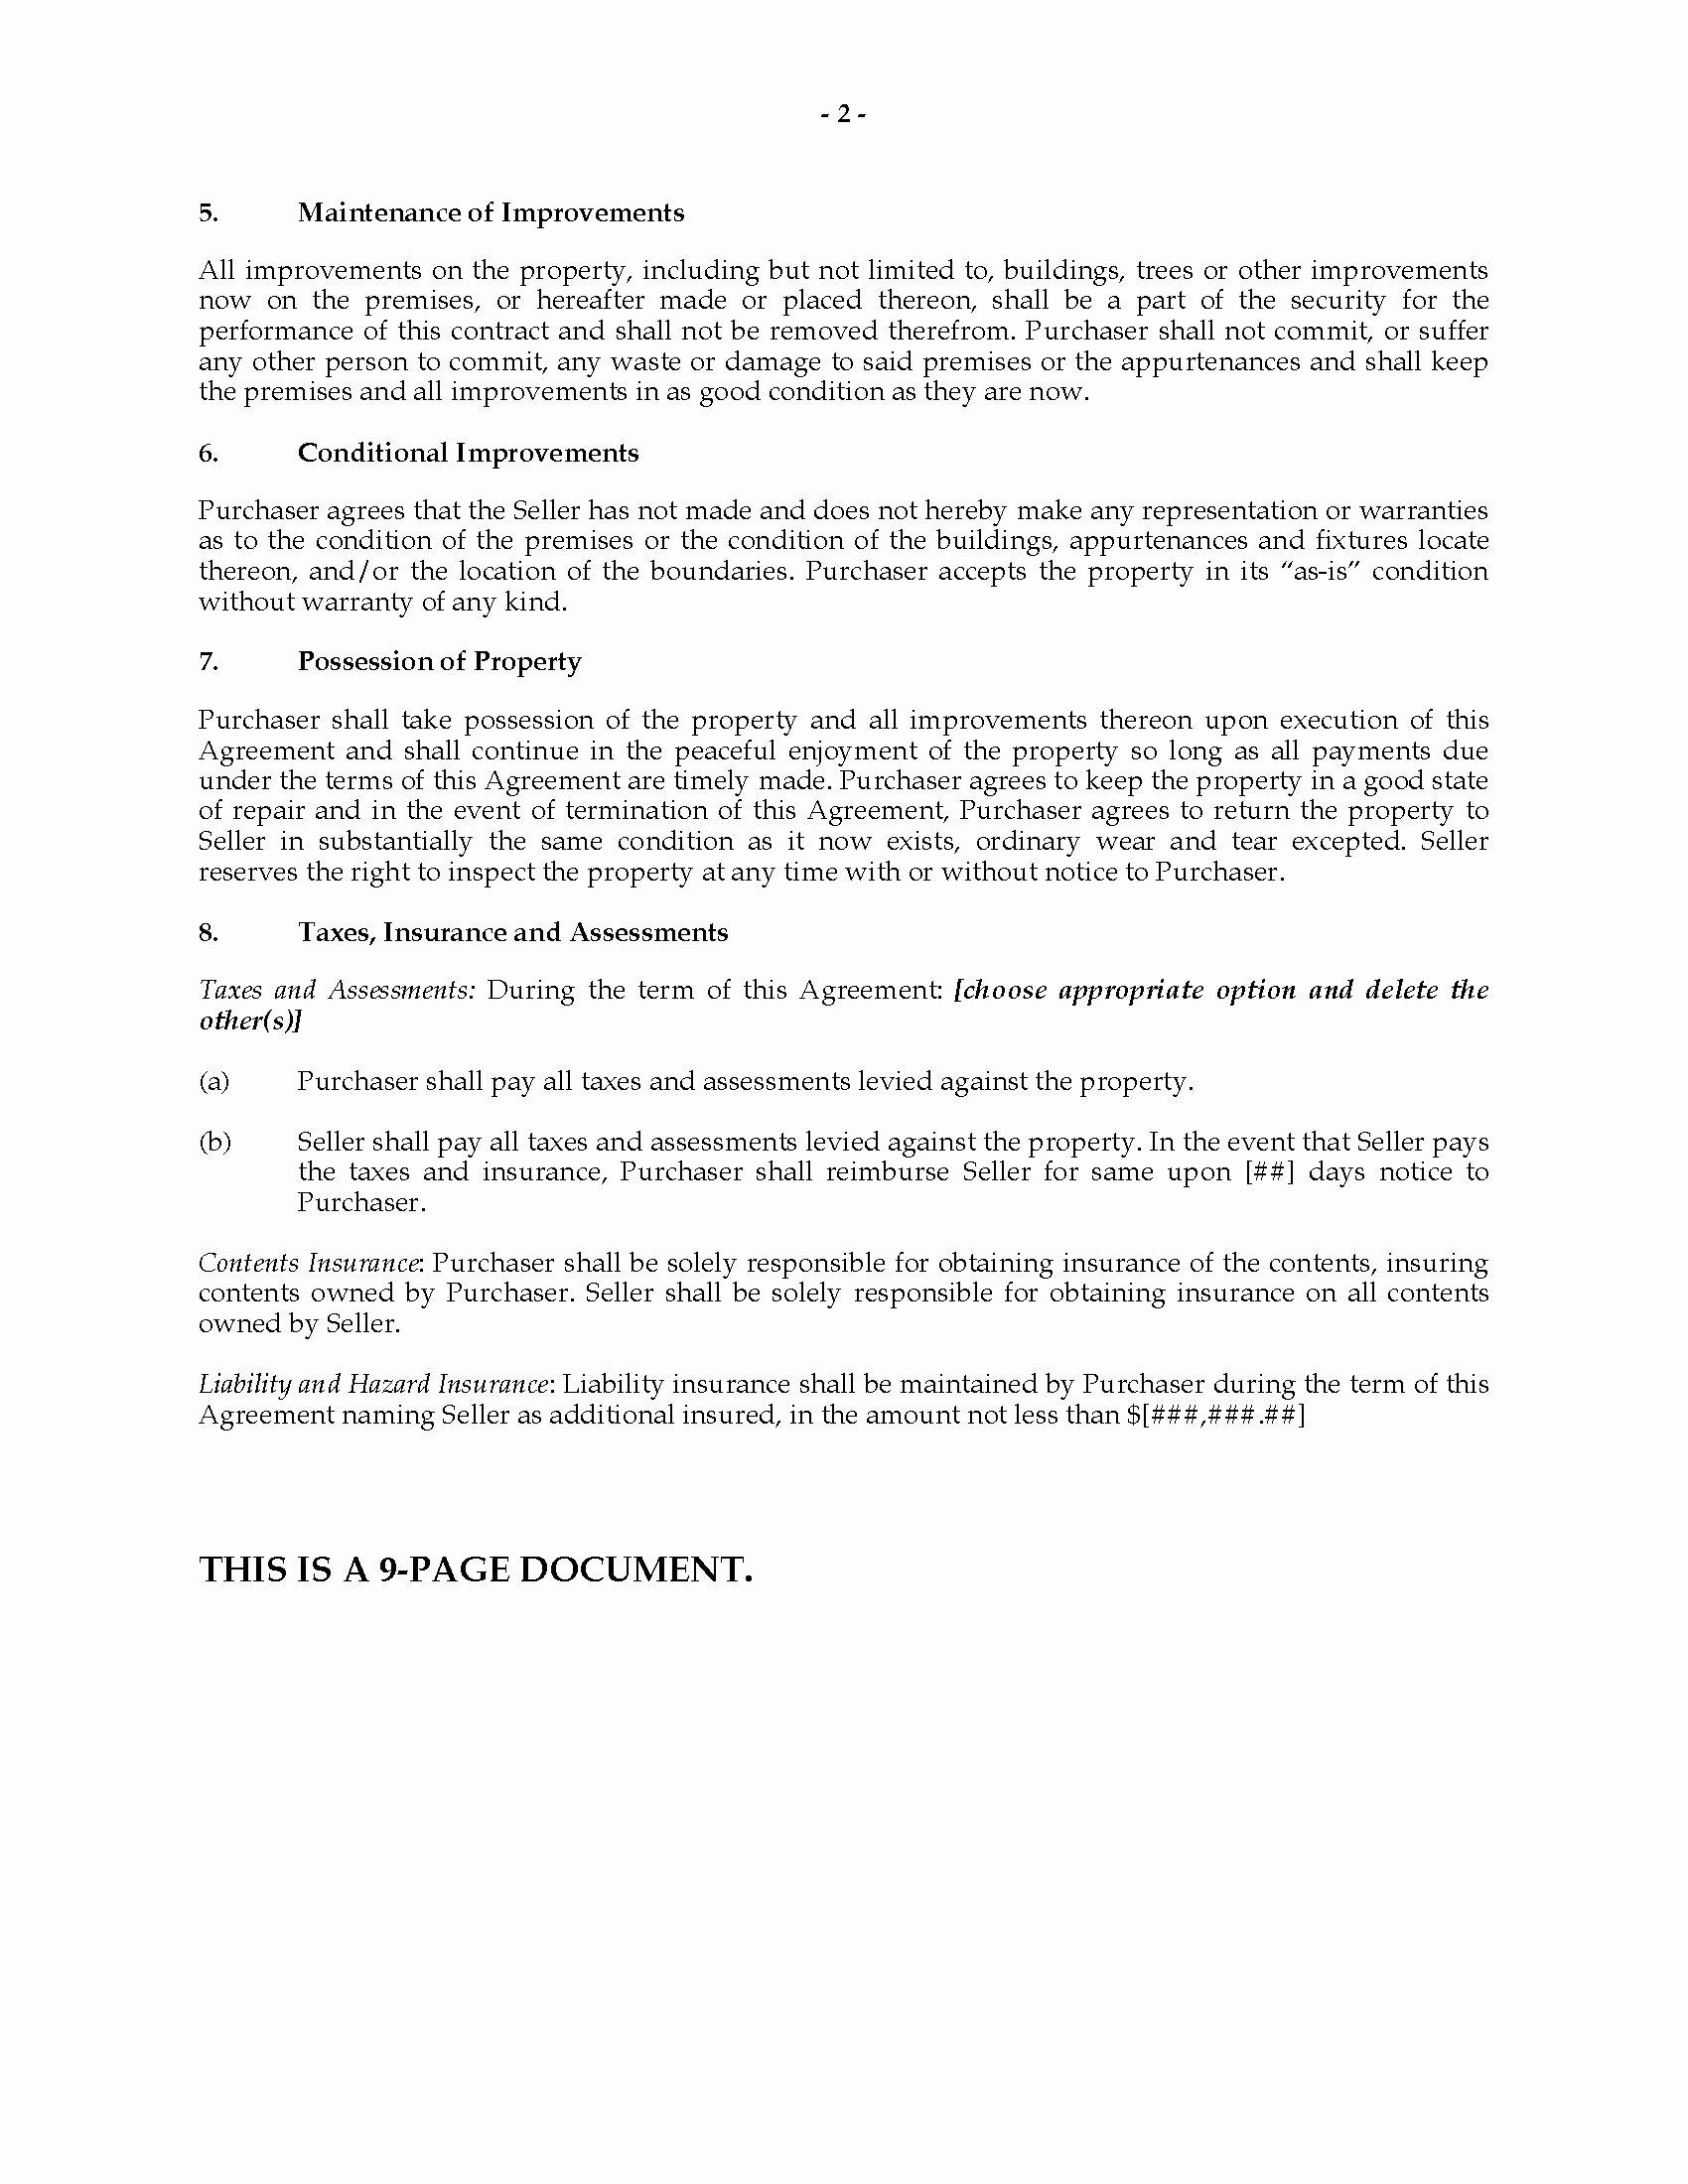 Land Contract Template Ohio Luxury Ohio Installment Land Contract